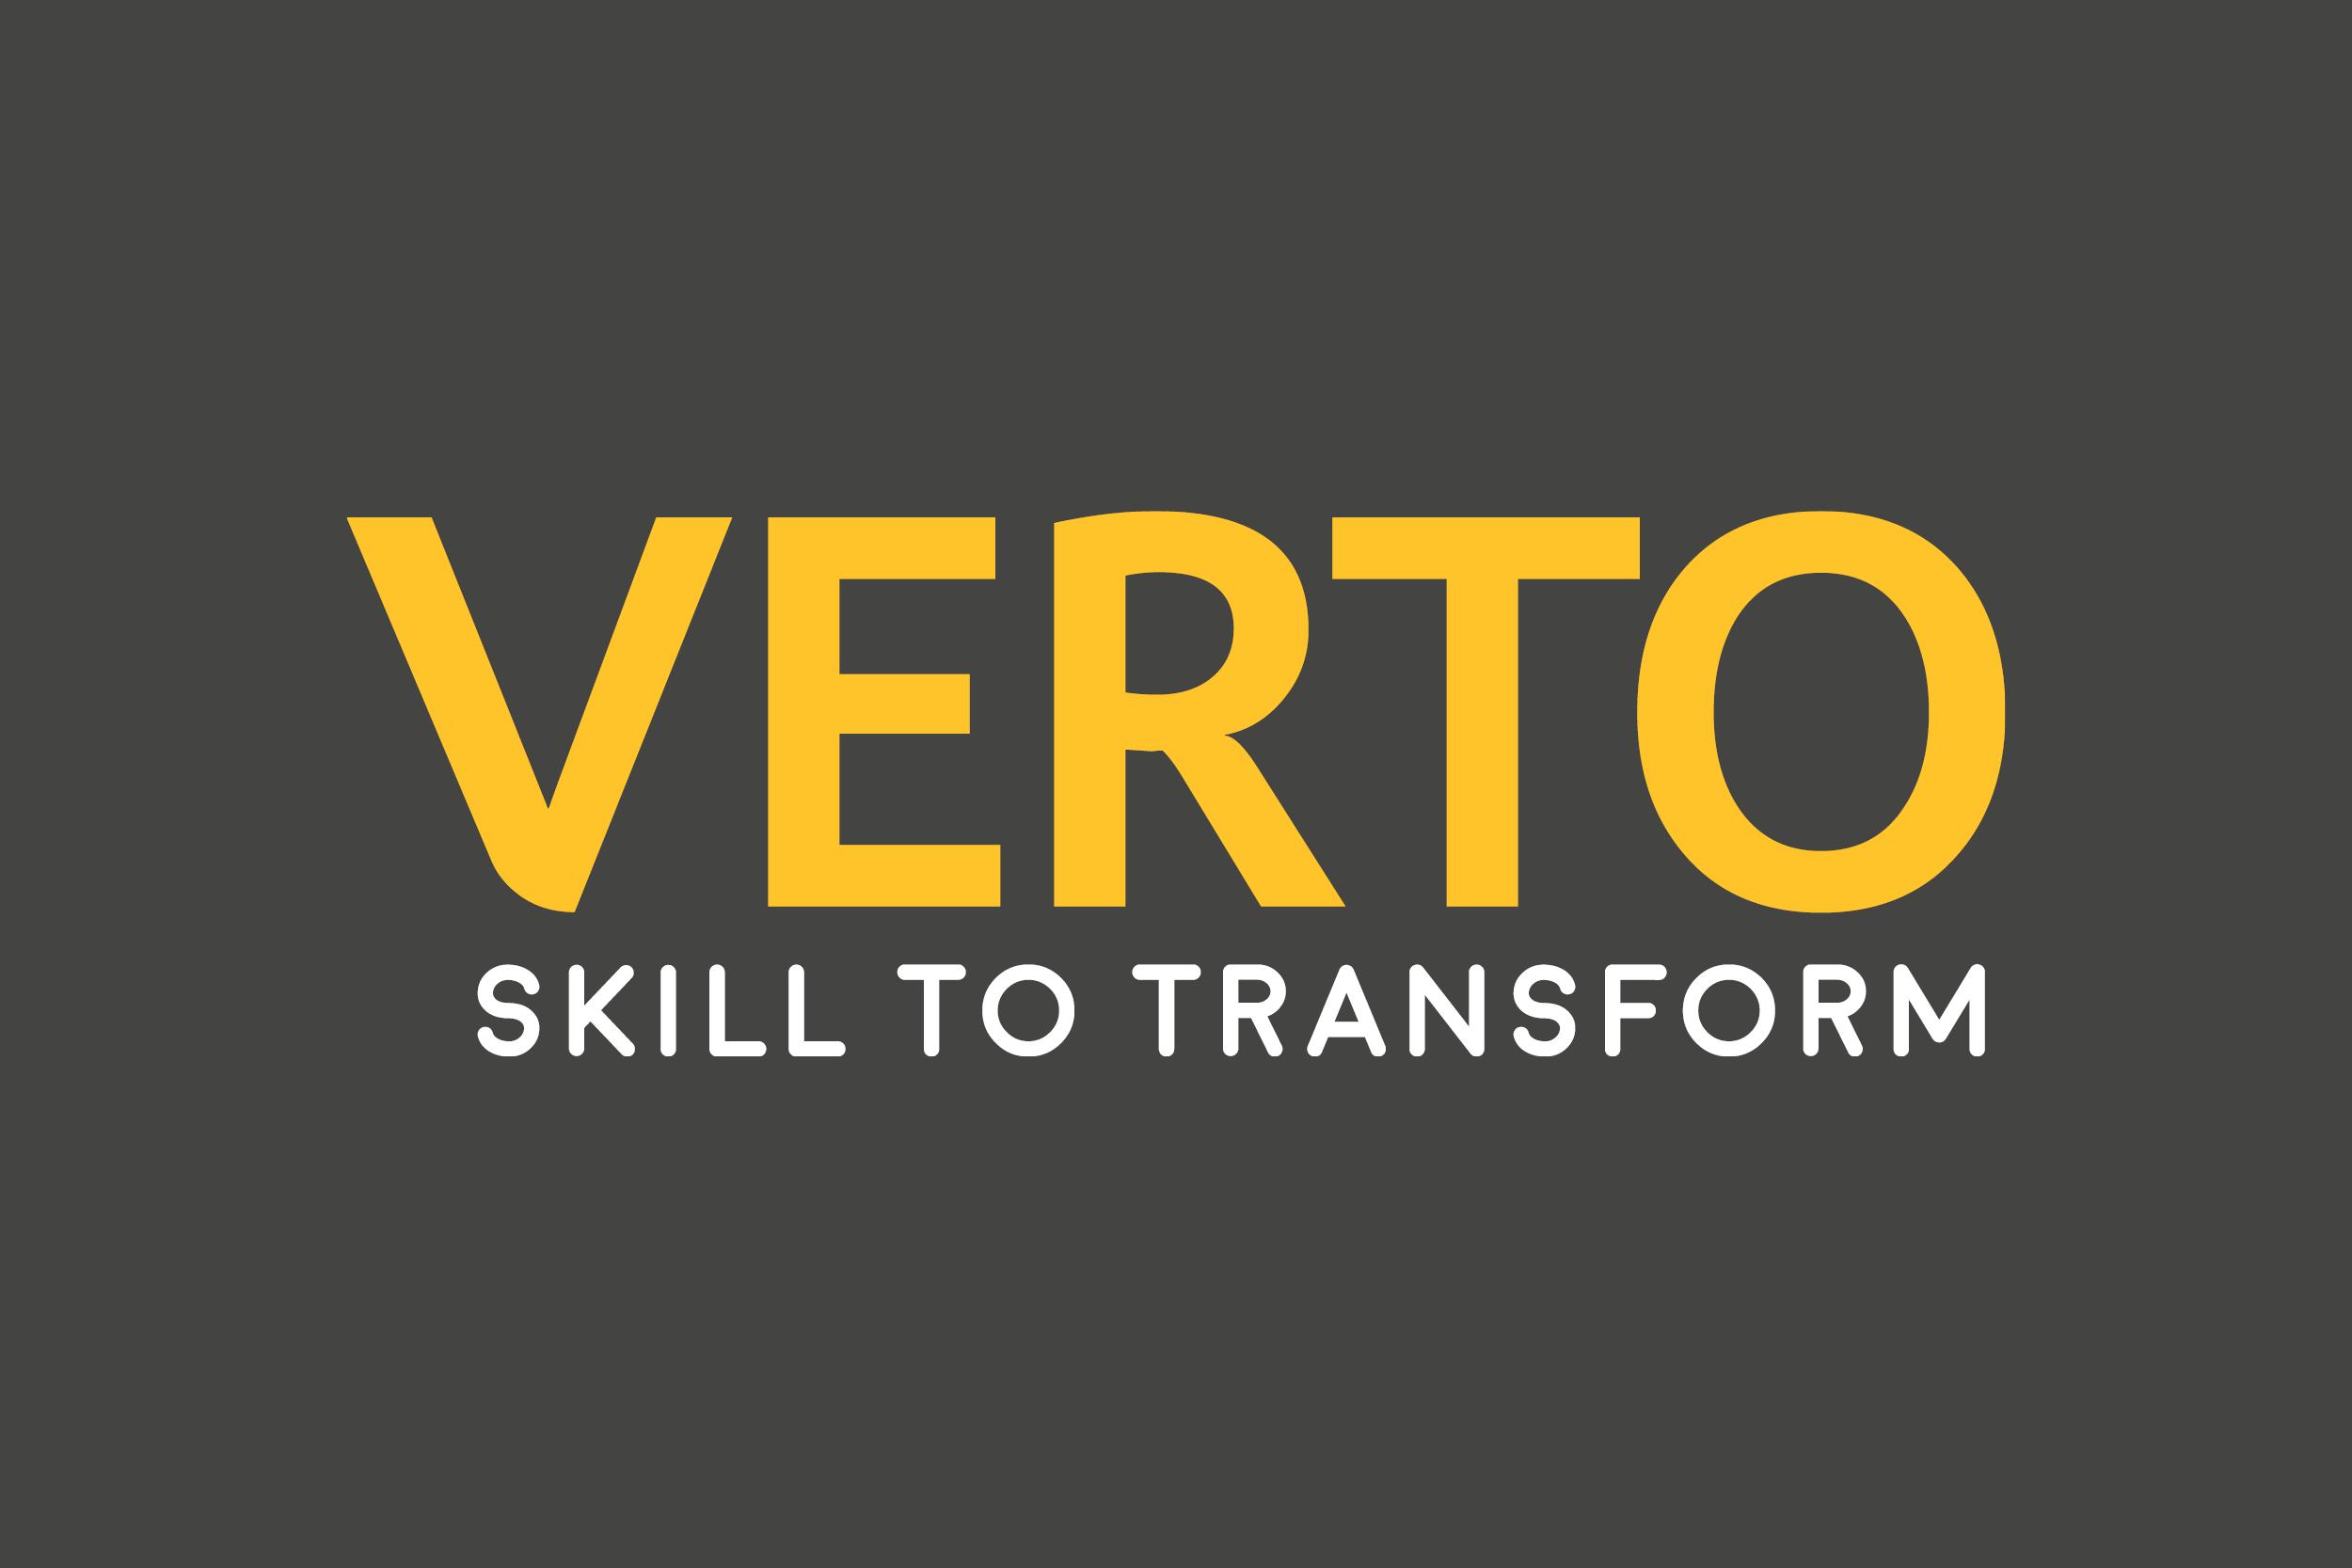 VERTO_Yellow and charcoal (1)